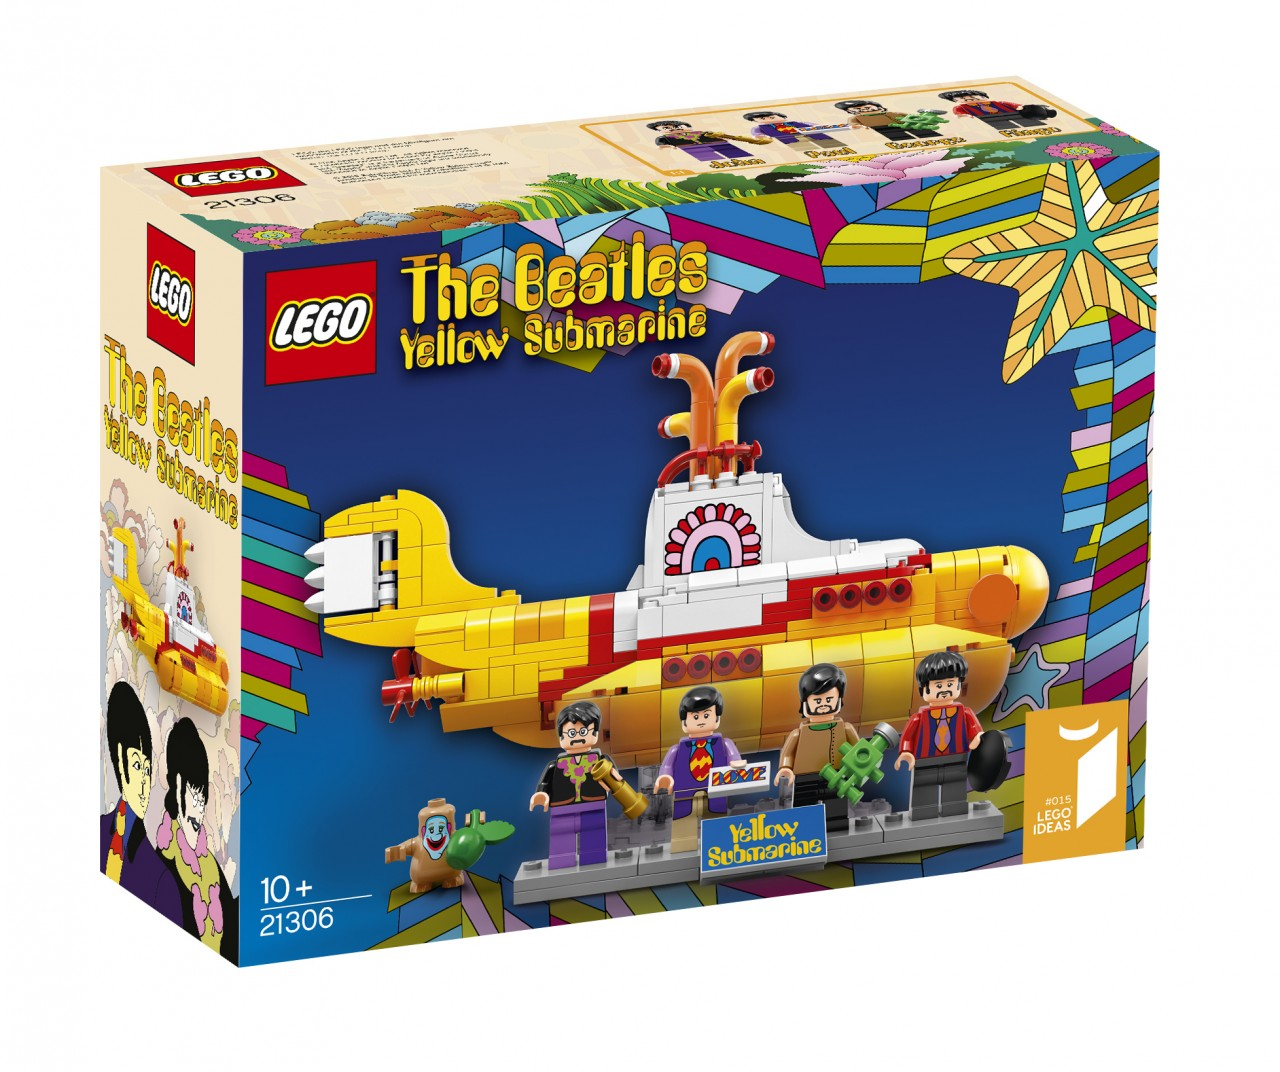 LEGO Yellow Submarine The Beatles - 3